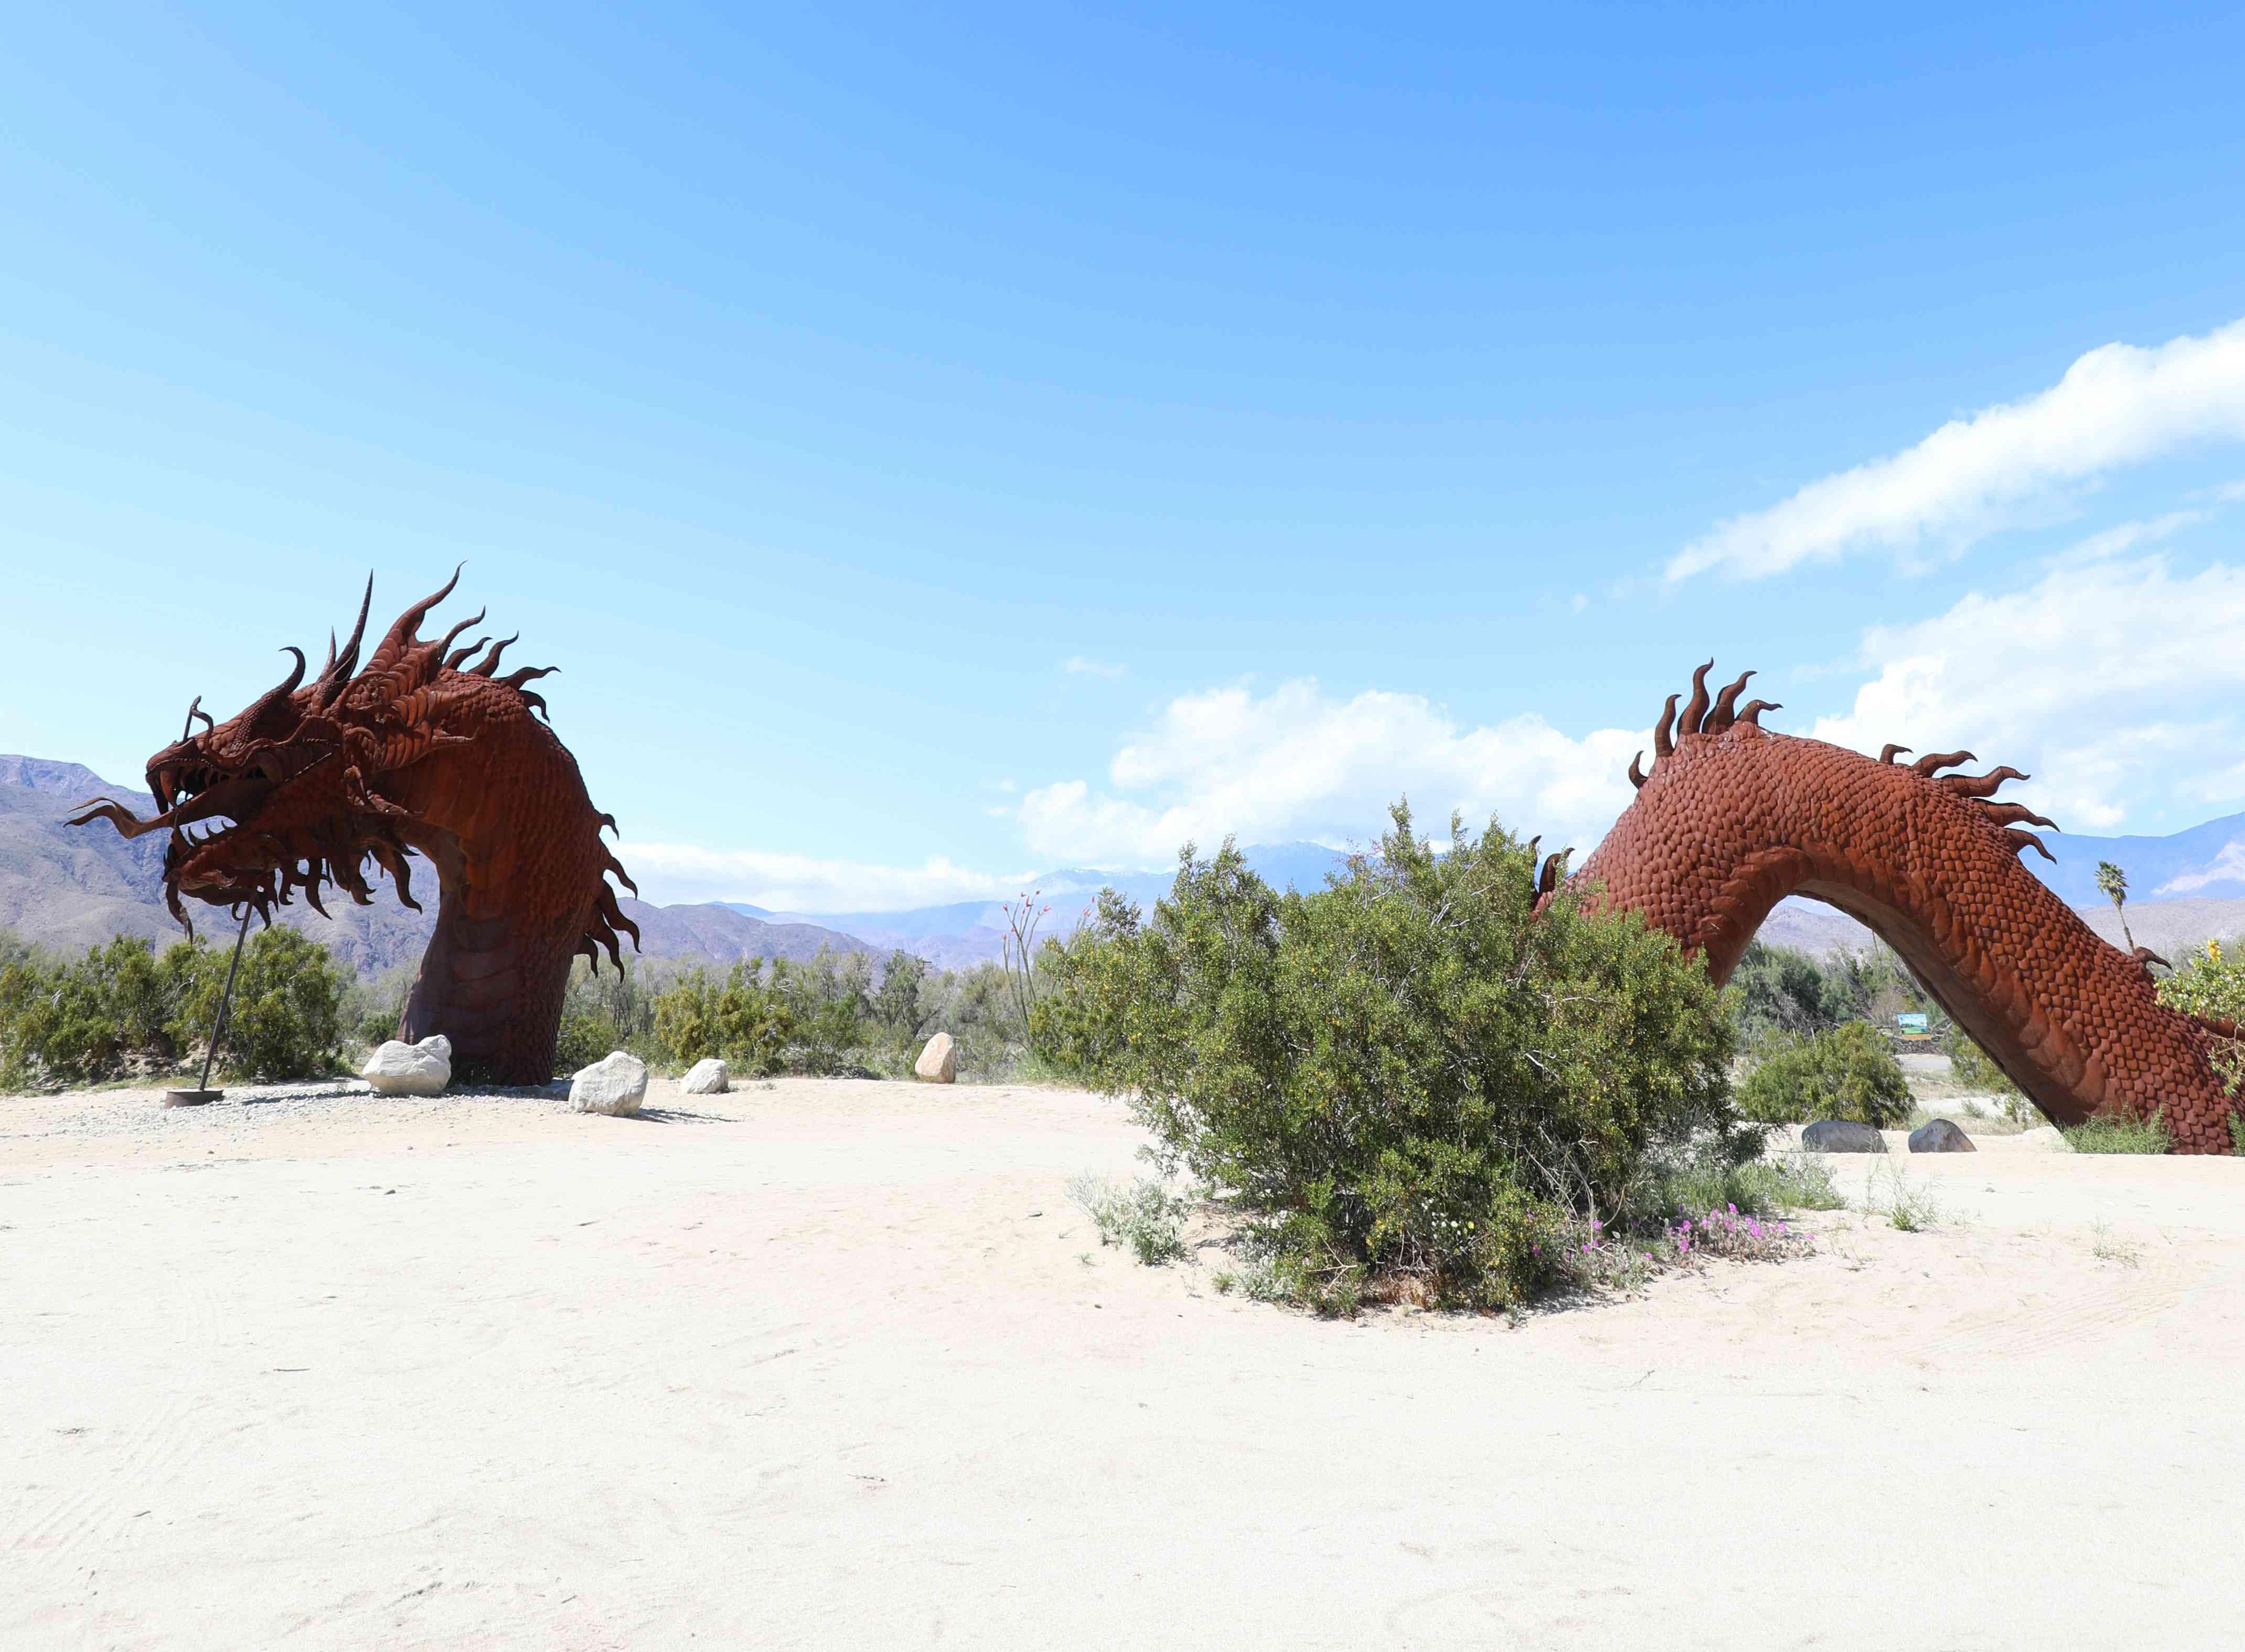 Ricardo Breceda art at Galleta Meadows